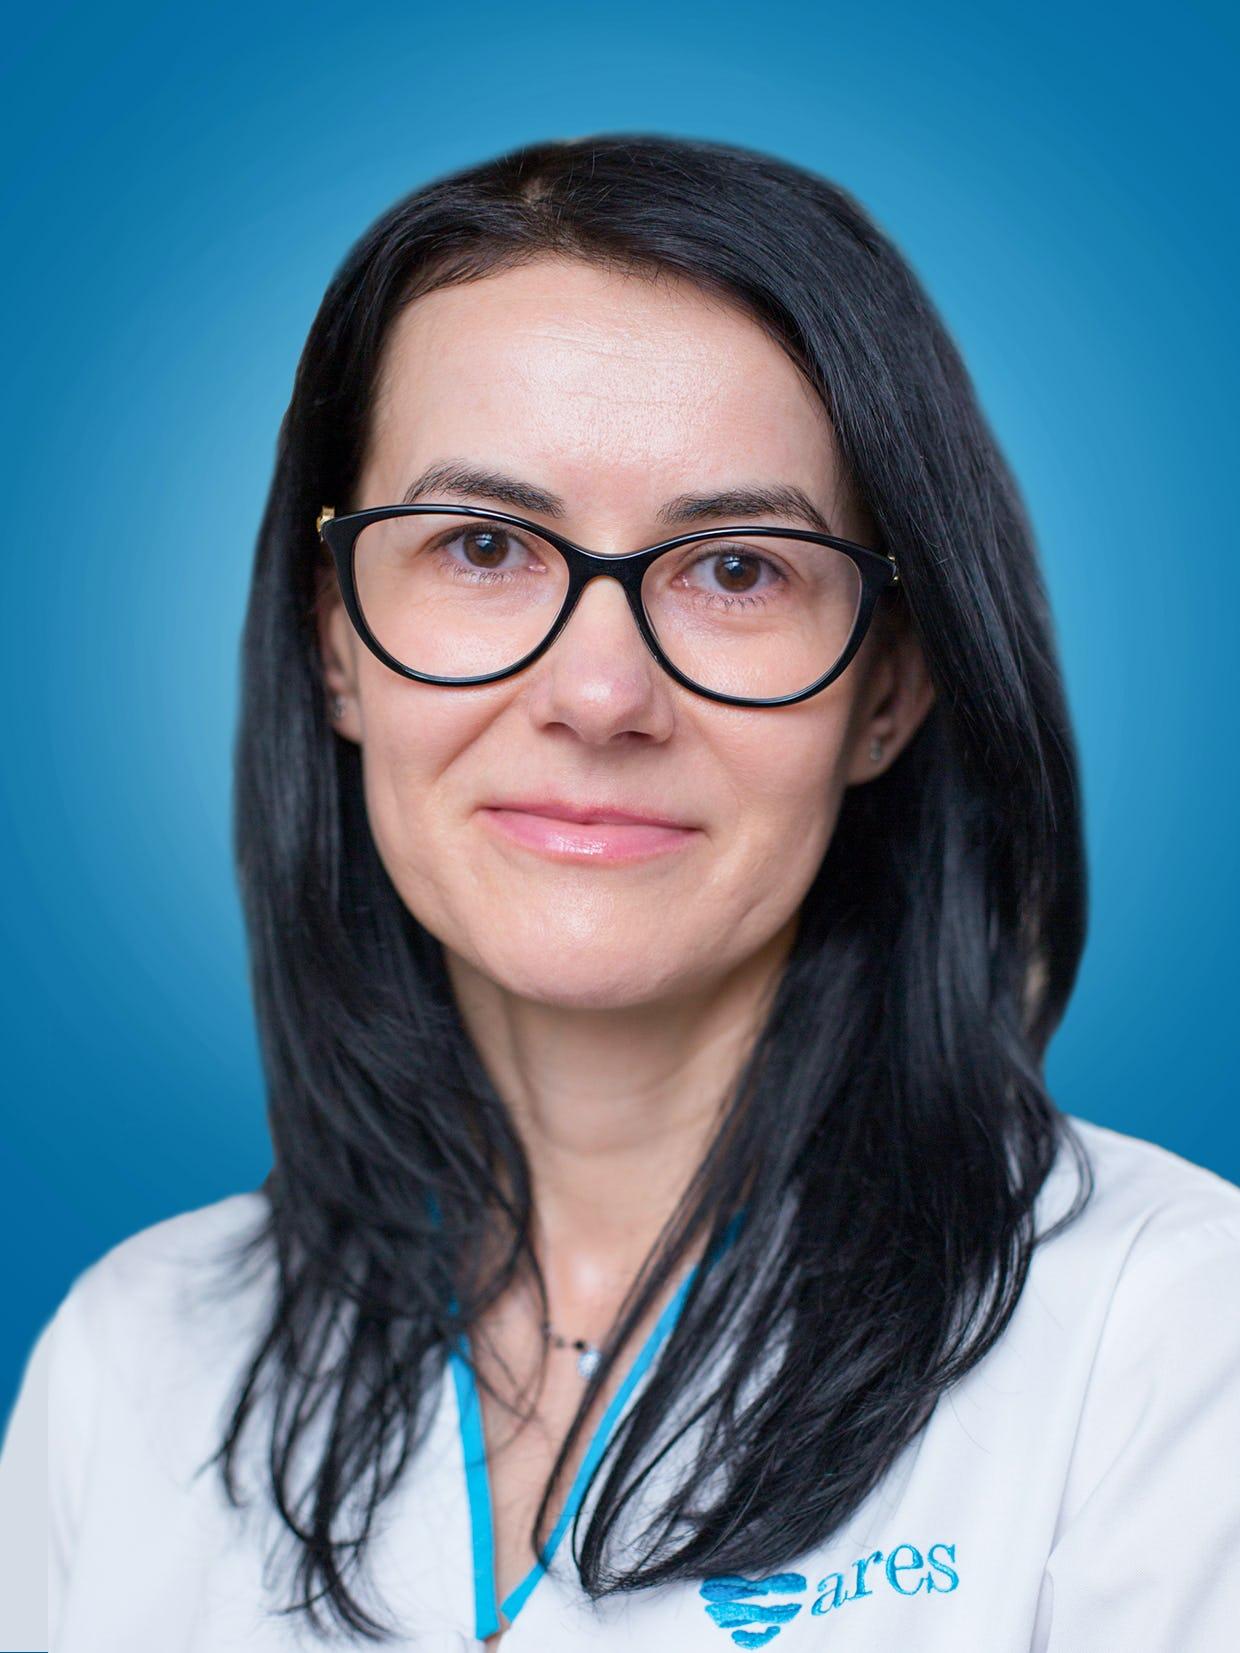 Doctor Mihaela Amariei, medic primar cardiolog la Centrele Ares